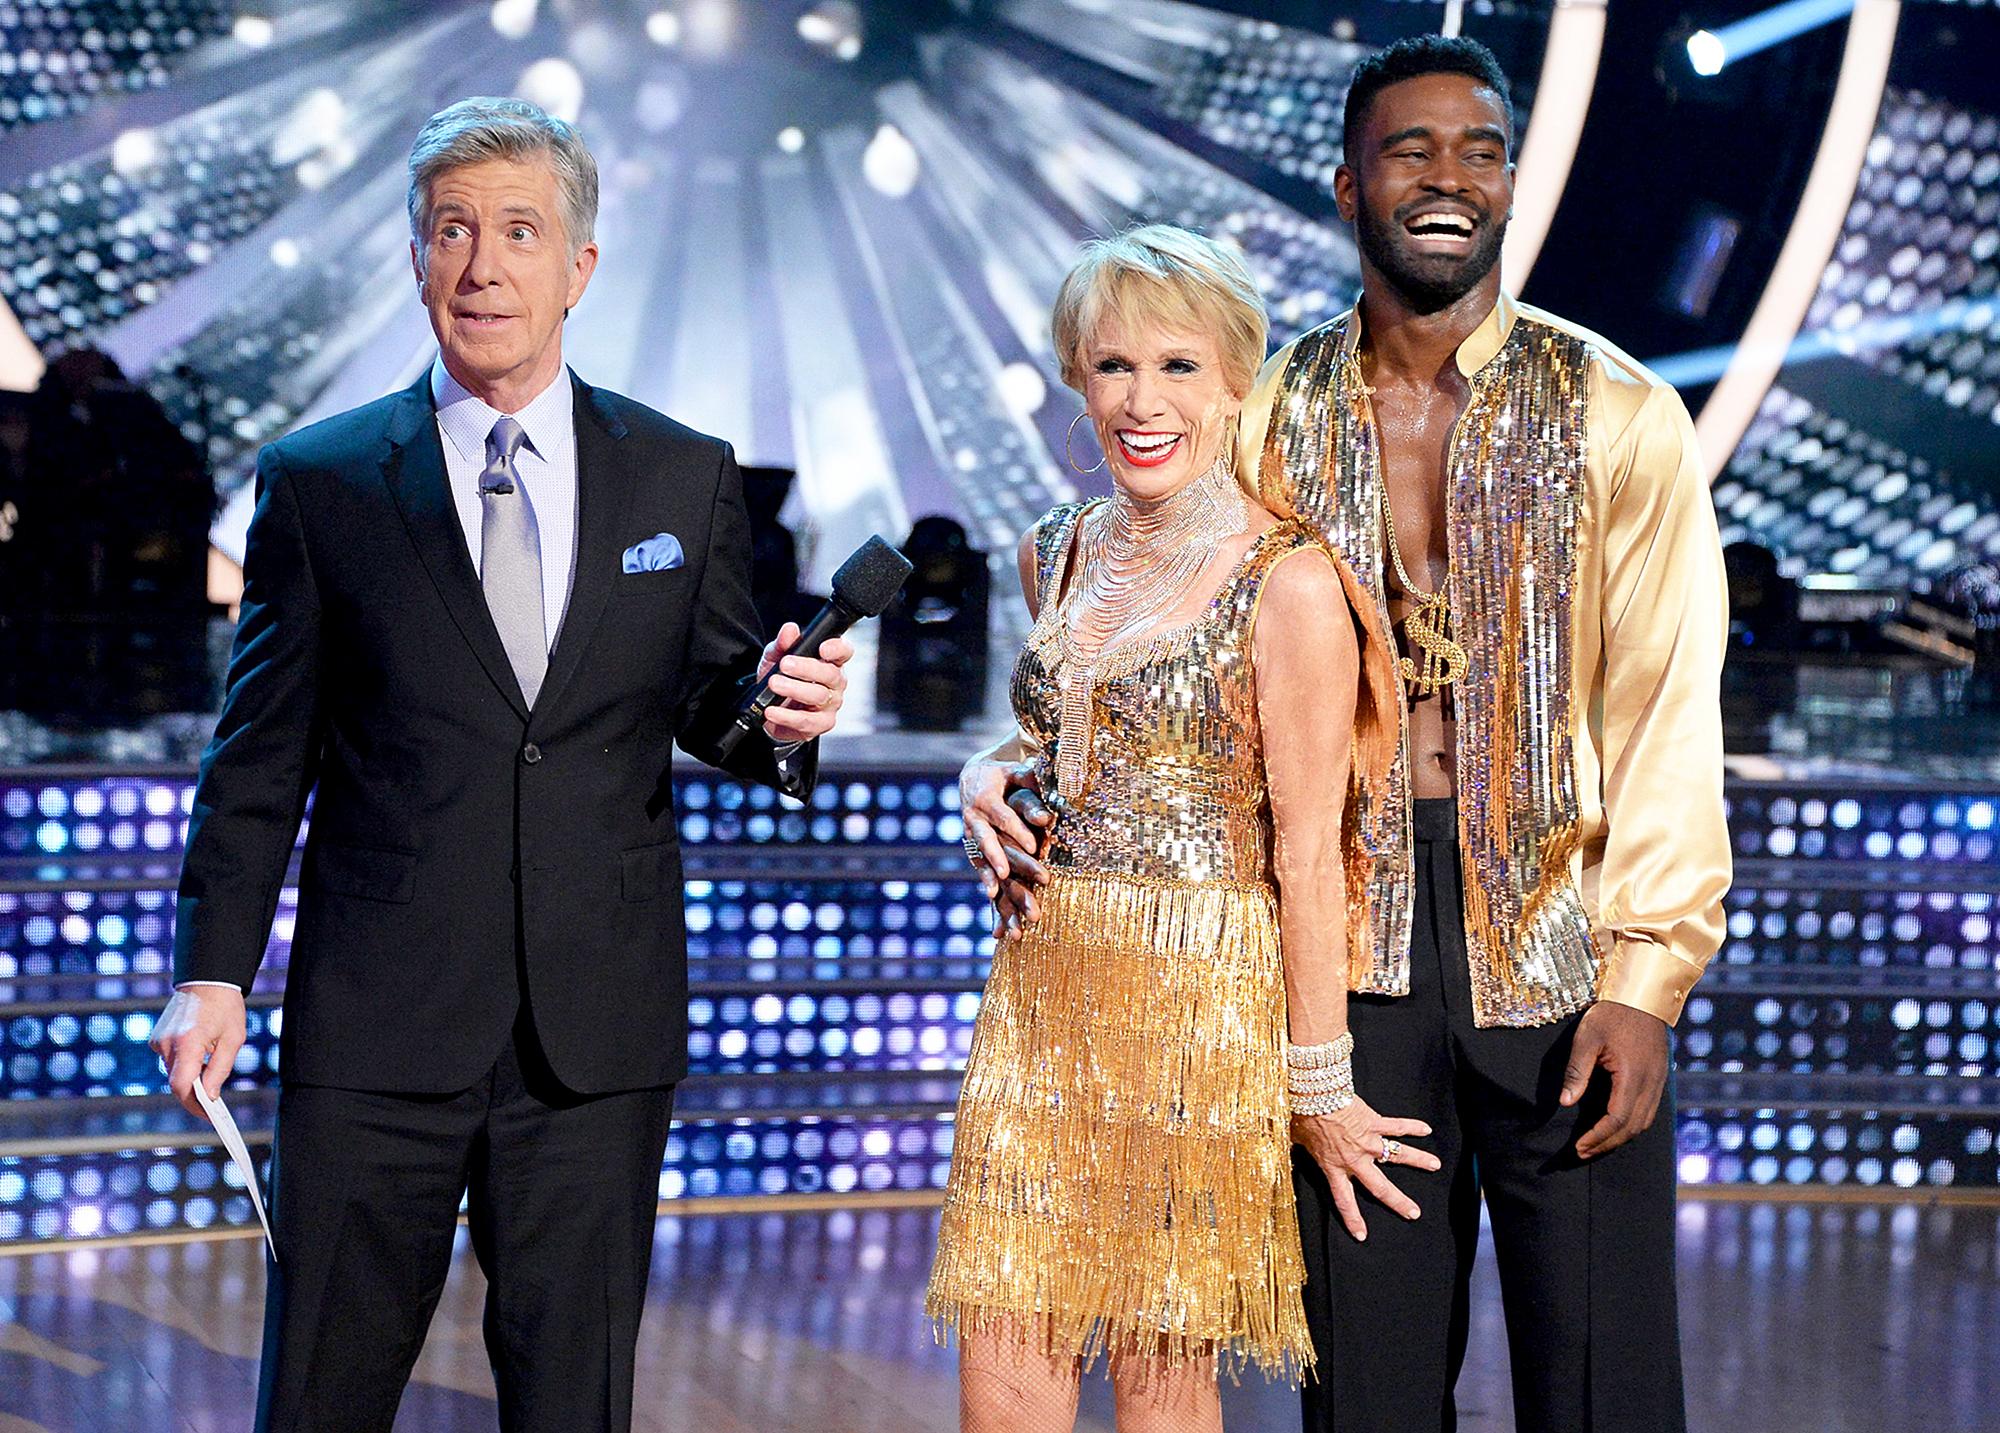 Tom Bergeron, Barbara Corcoran and Keo Motsepe Dancing With The Stars